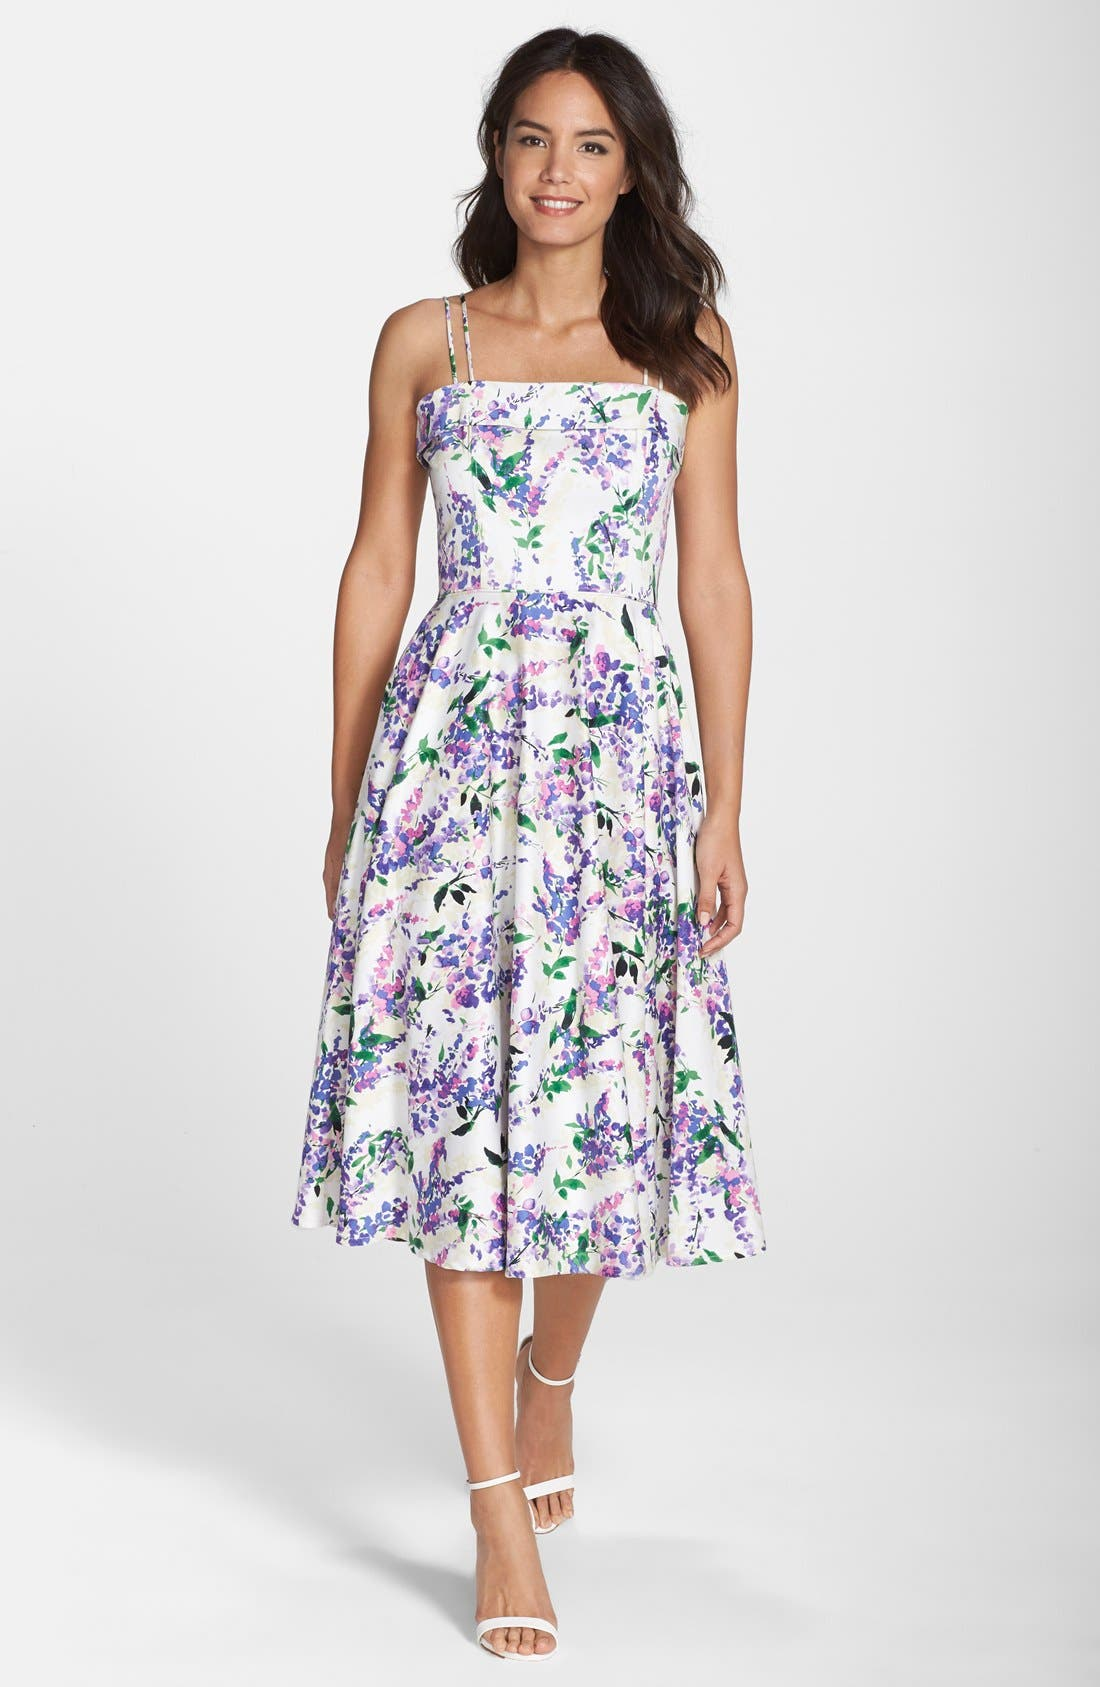 Maggy London Floral Print Fit Flare Midi Dress Regular